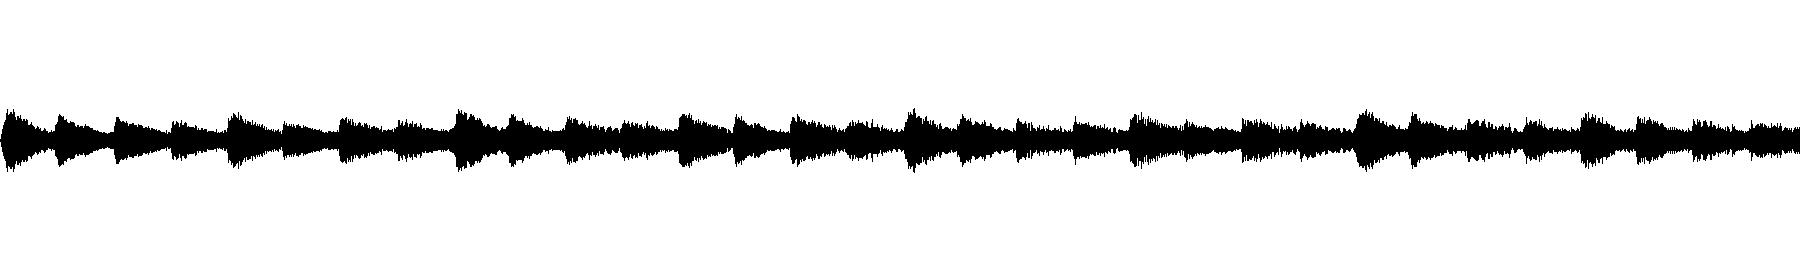 yukibeatz trap piano melody 130 bpm cm